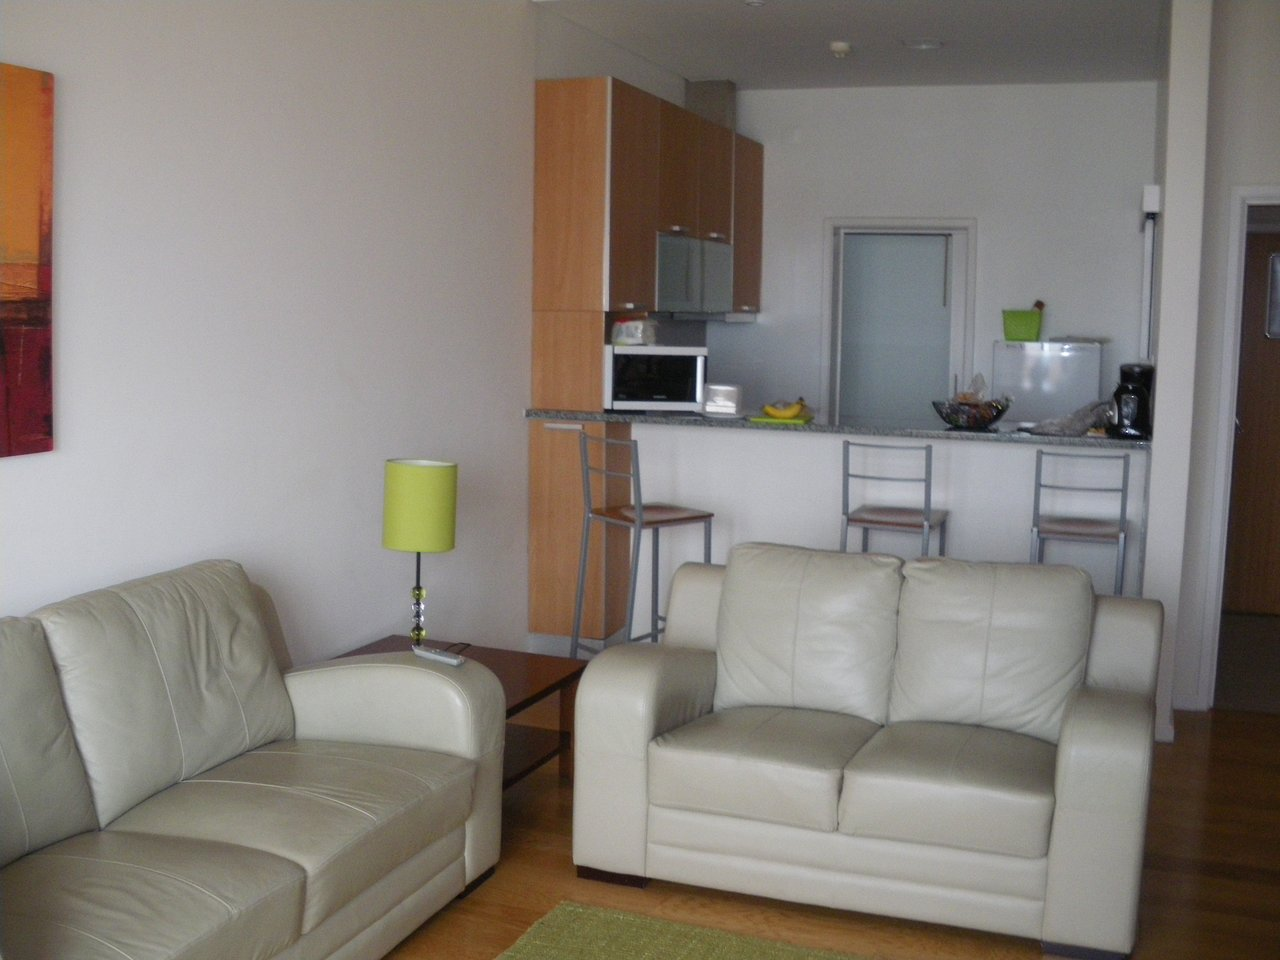 Duplex Alojamentos Centro Comercial Solmar Prices Condominium